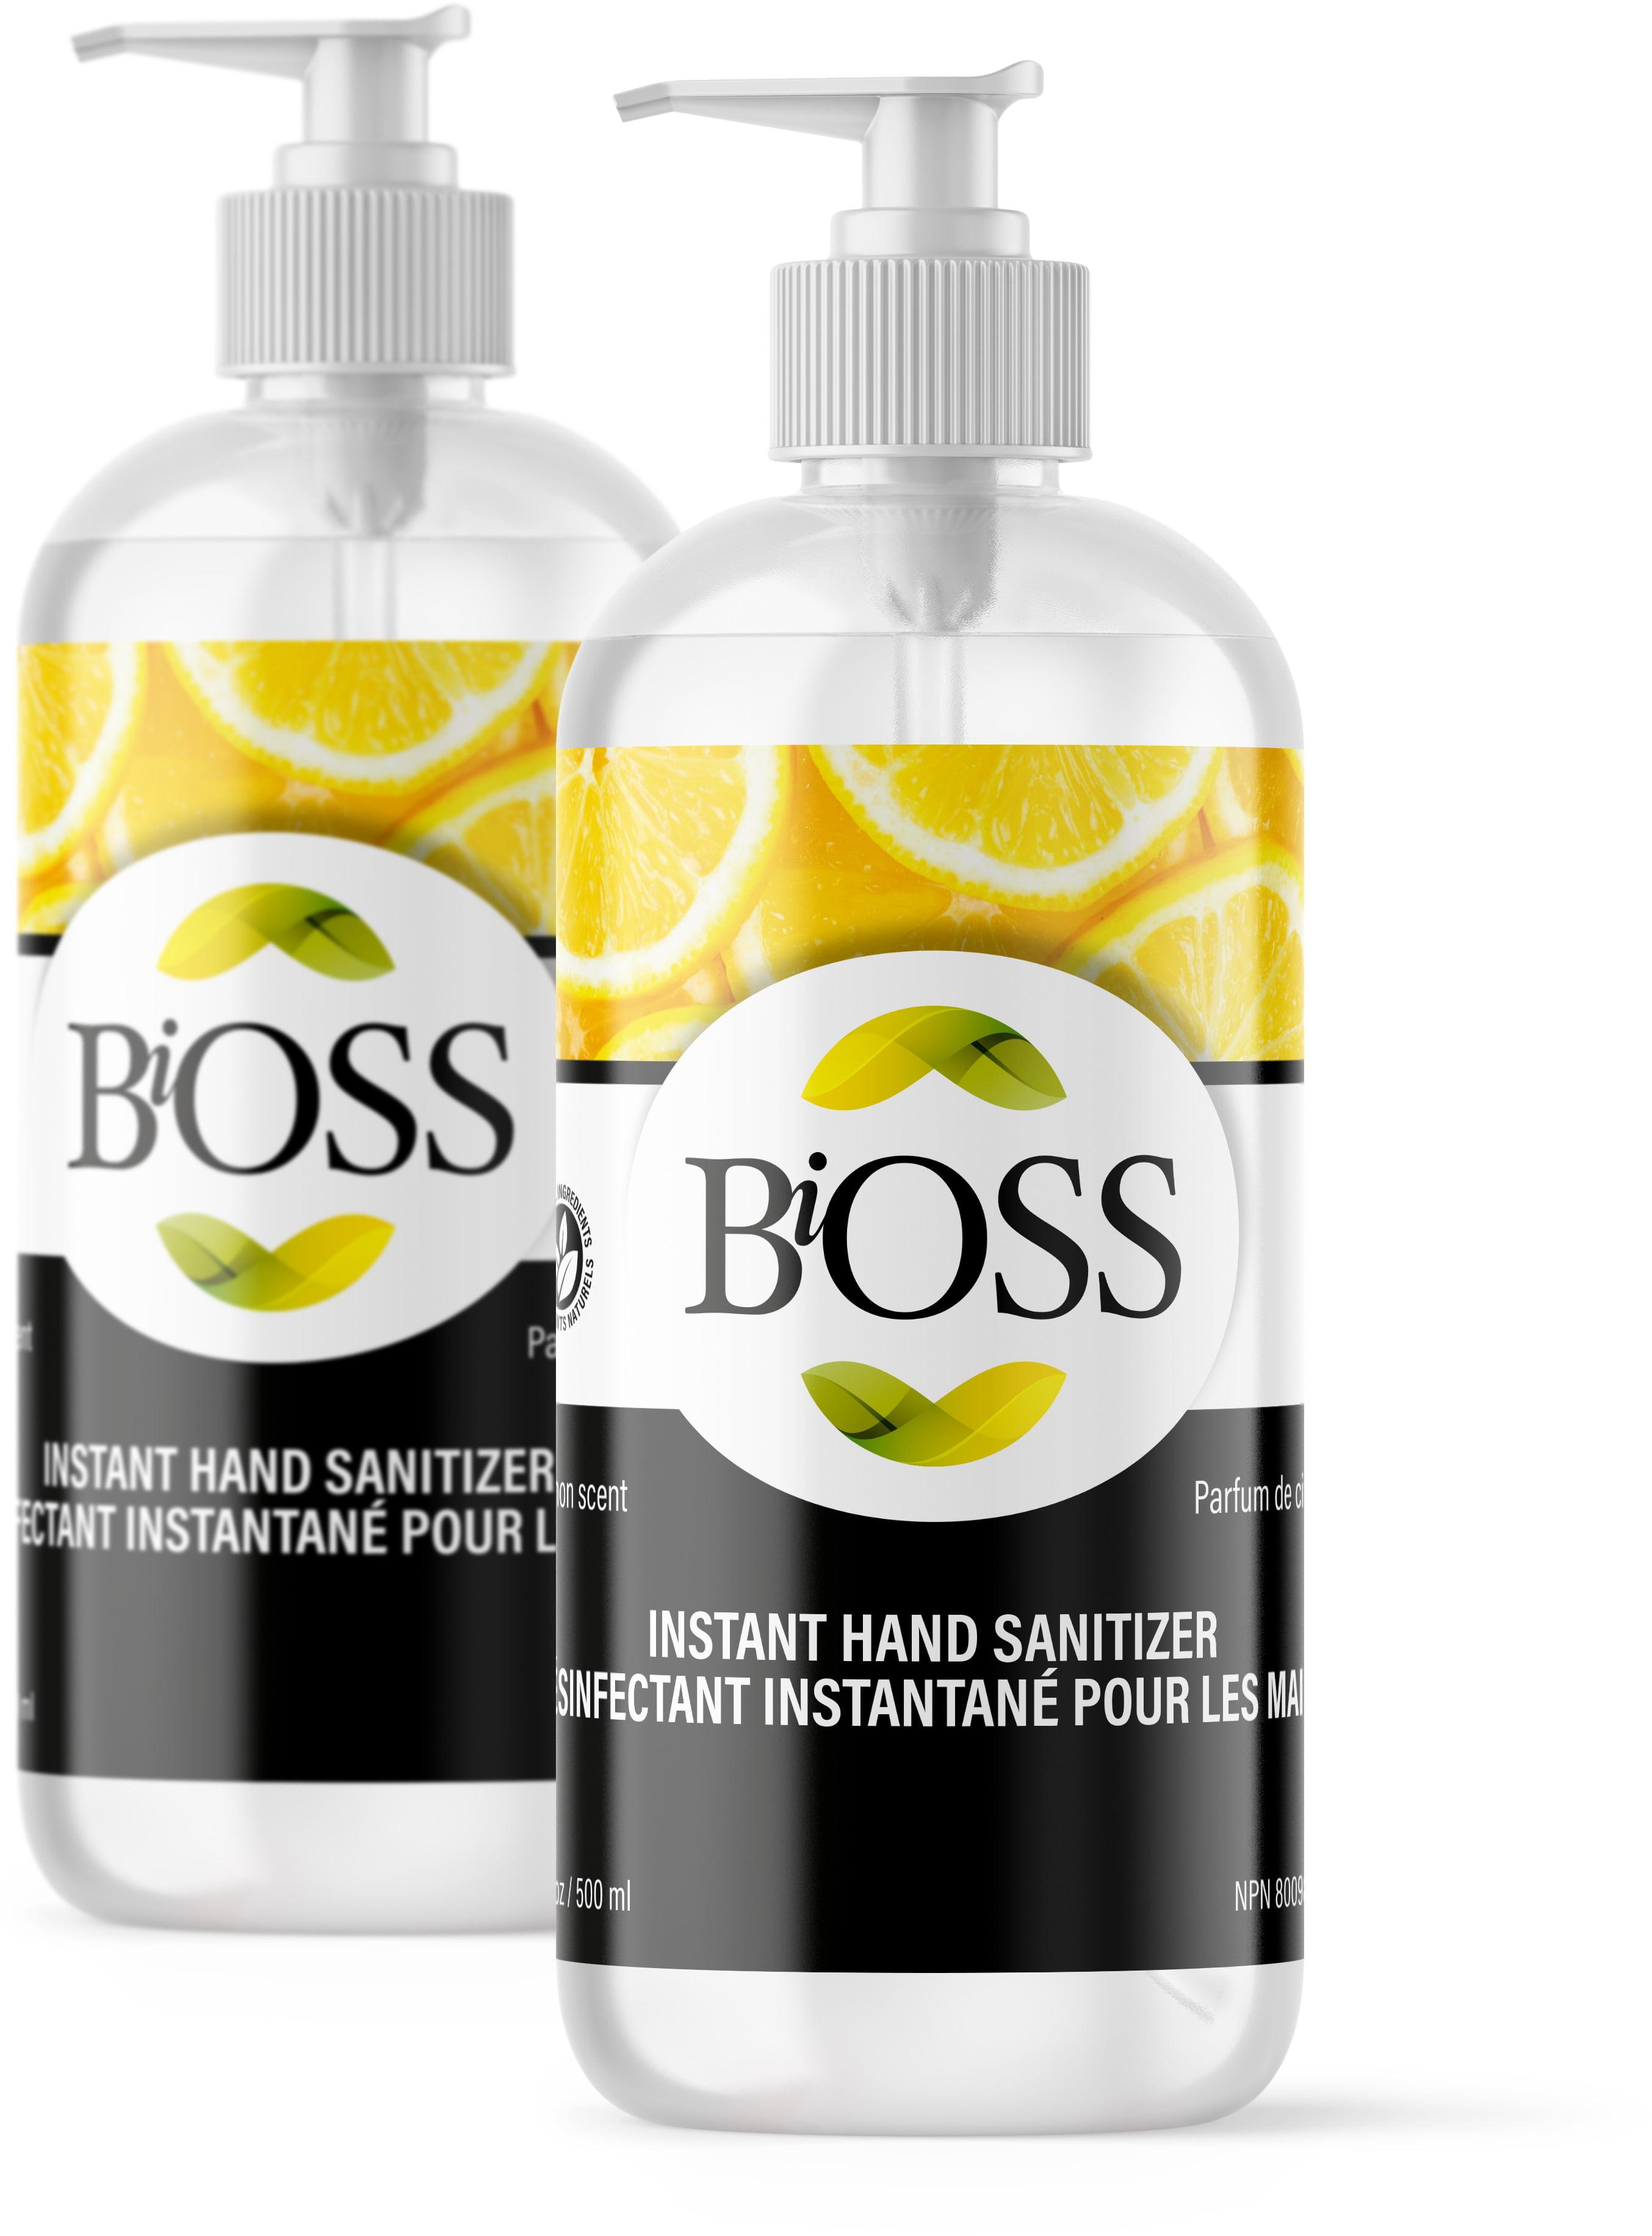 2 Pack Instant Hand Sanitizer 75 Ethyl Alcohol Food Grade Lemon Fragrance With Pump Bottle Skin Friendly Manufactured In Canada Walmart Canada